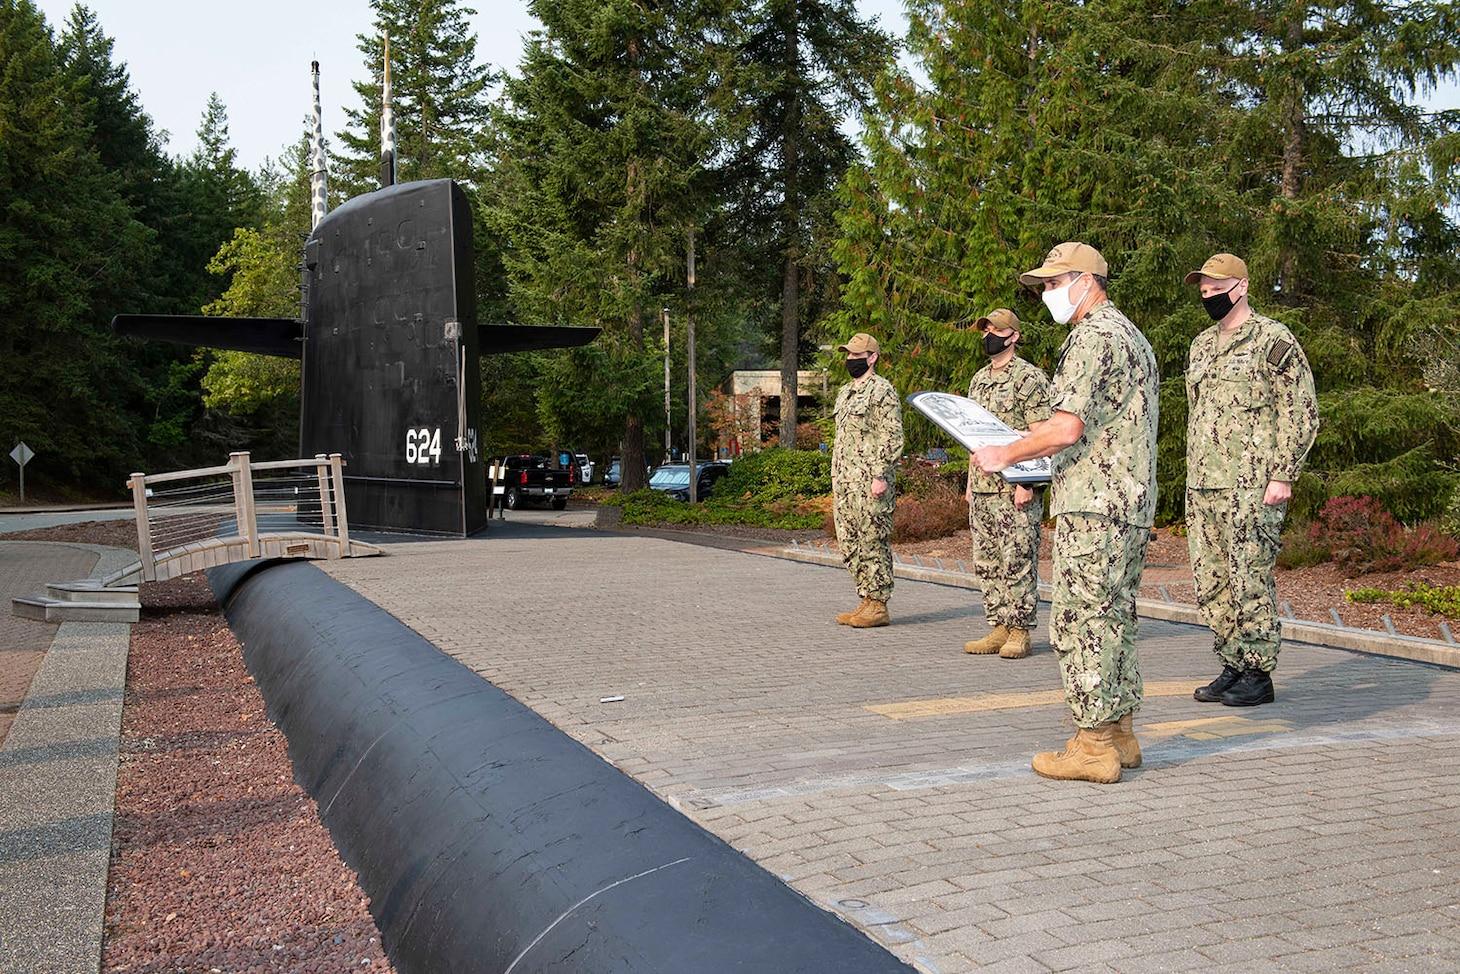 SILVERDALE, Wash. (Sept. 30, 2020) Rear Adm. Blake Converse, commander, Submarine Force, U.S. Pacific Fleet, presents The Arleigh Burke Fleet Trophy to the gold crew of USS Nebraska (SSBN 739), Sept. 30.